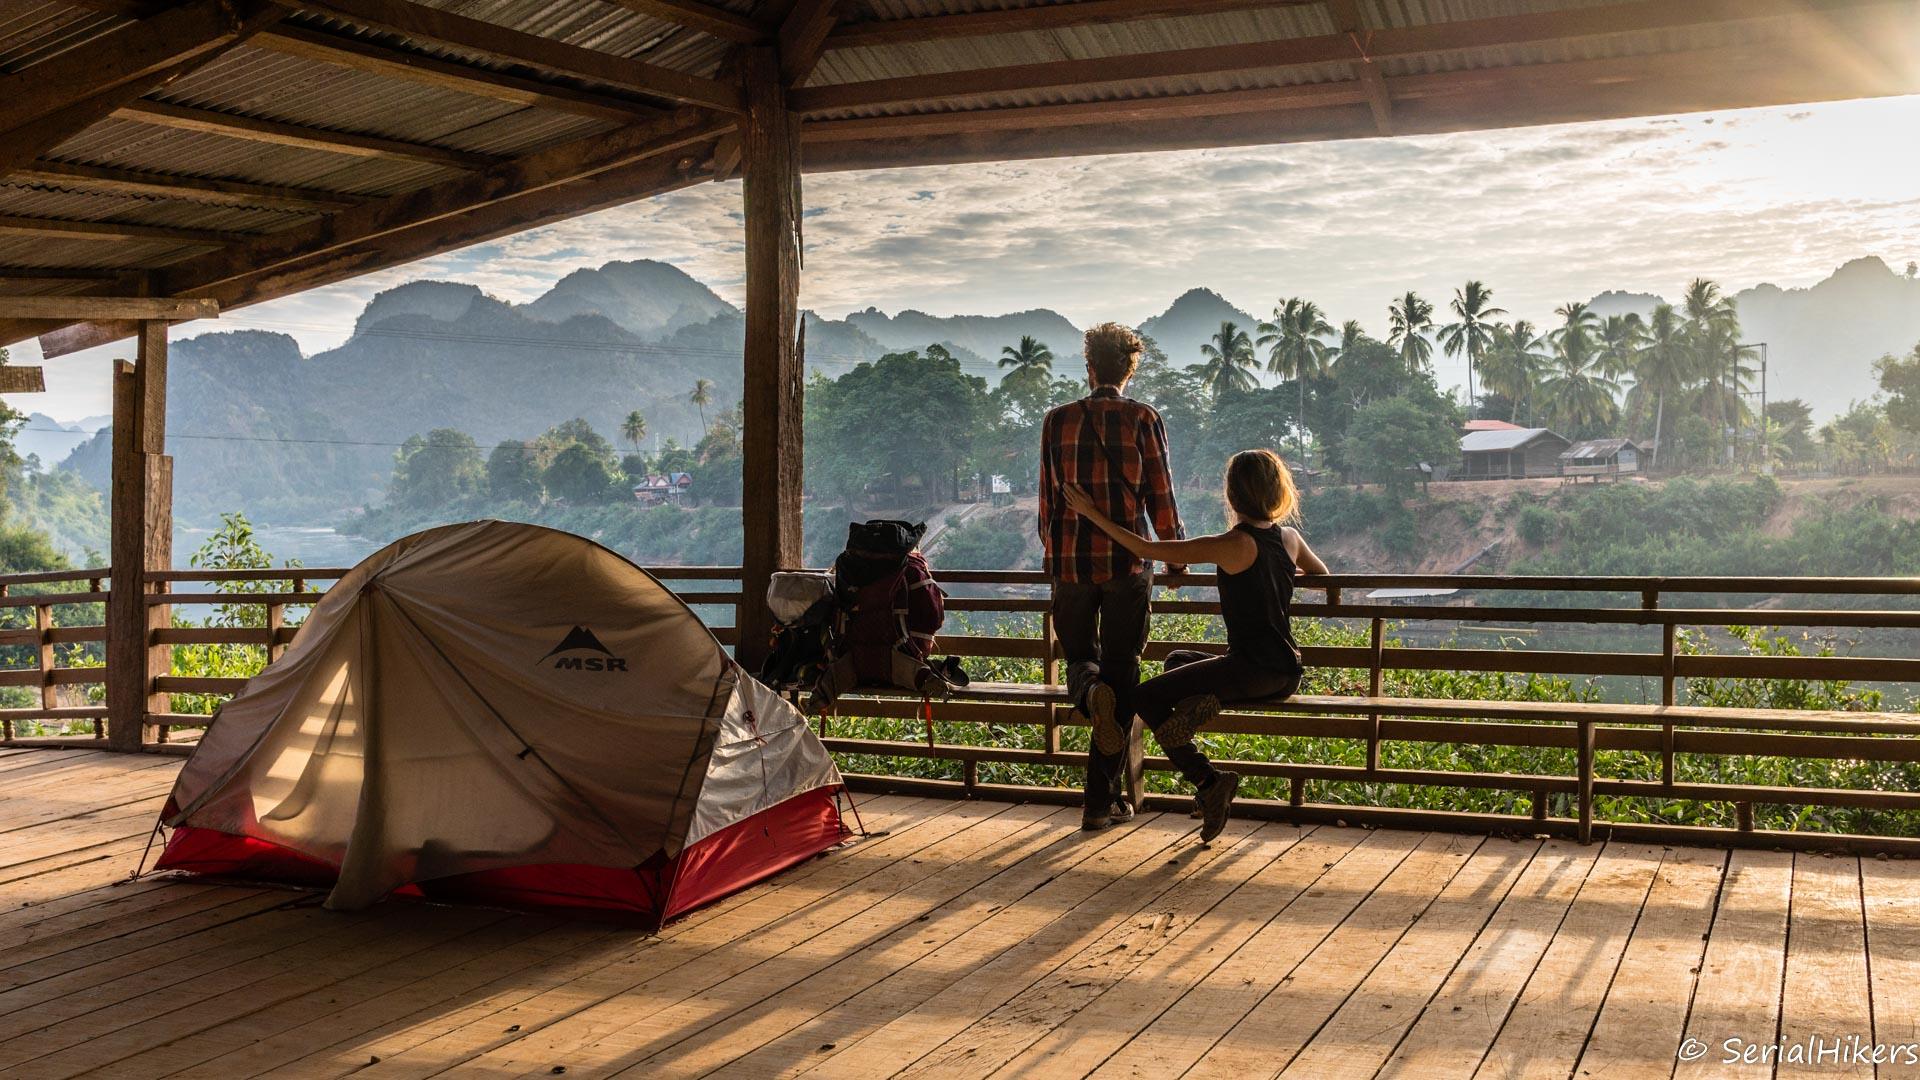 backpacking Jul&Gaux SerialHikers autostop hitchhiking aventure adventure alternative travel voyage volontariat volunteering Laos Mahaxay boucle Thakhek loop